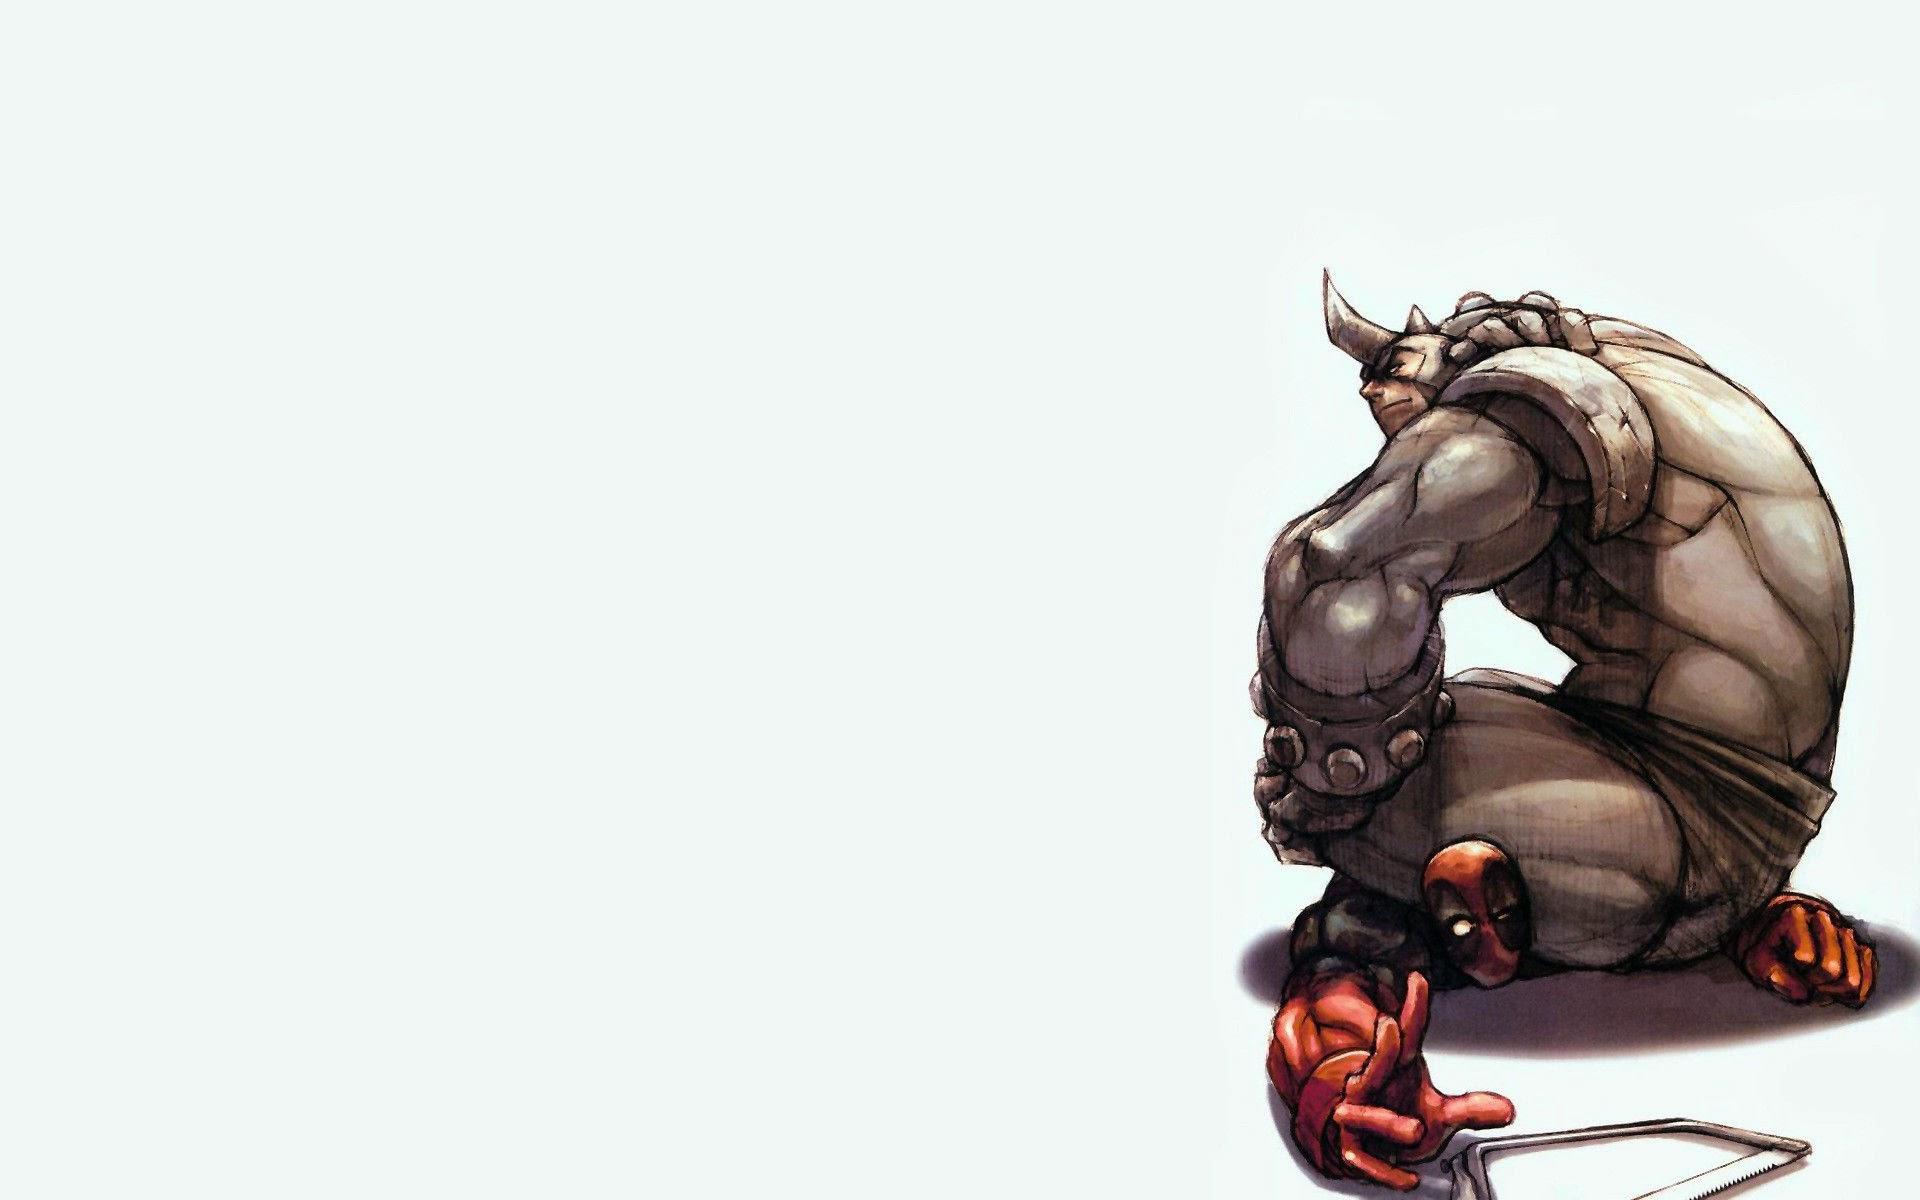 Deadpool Rhino Marvel Comics HD Wallpaper 1920x1200 widescreen a75 1920x1200